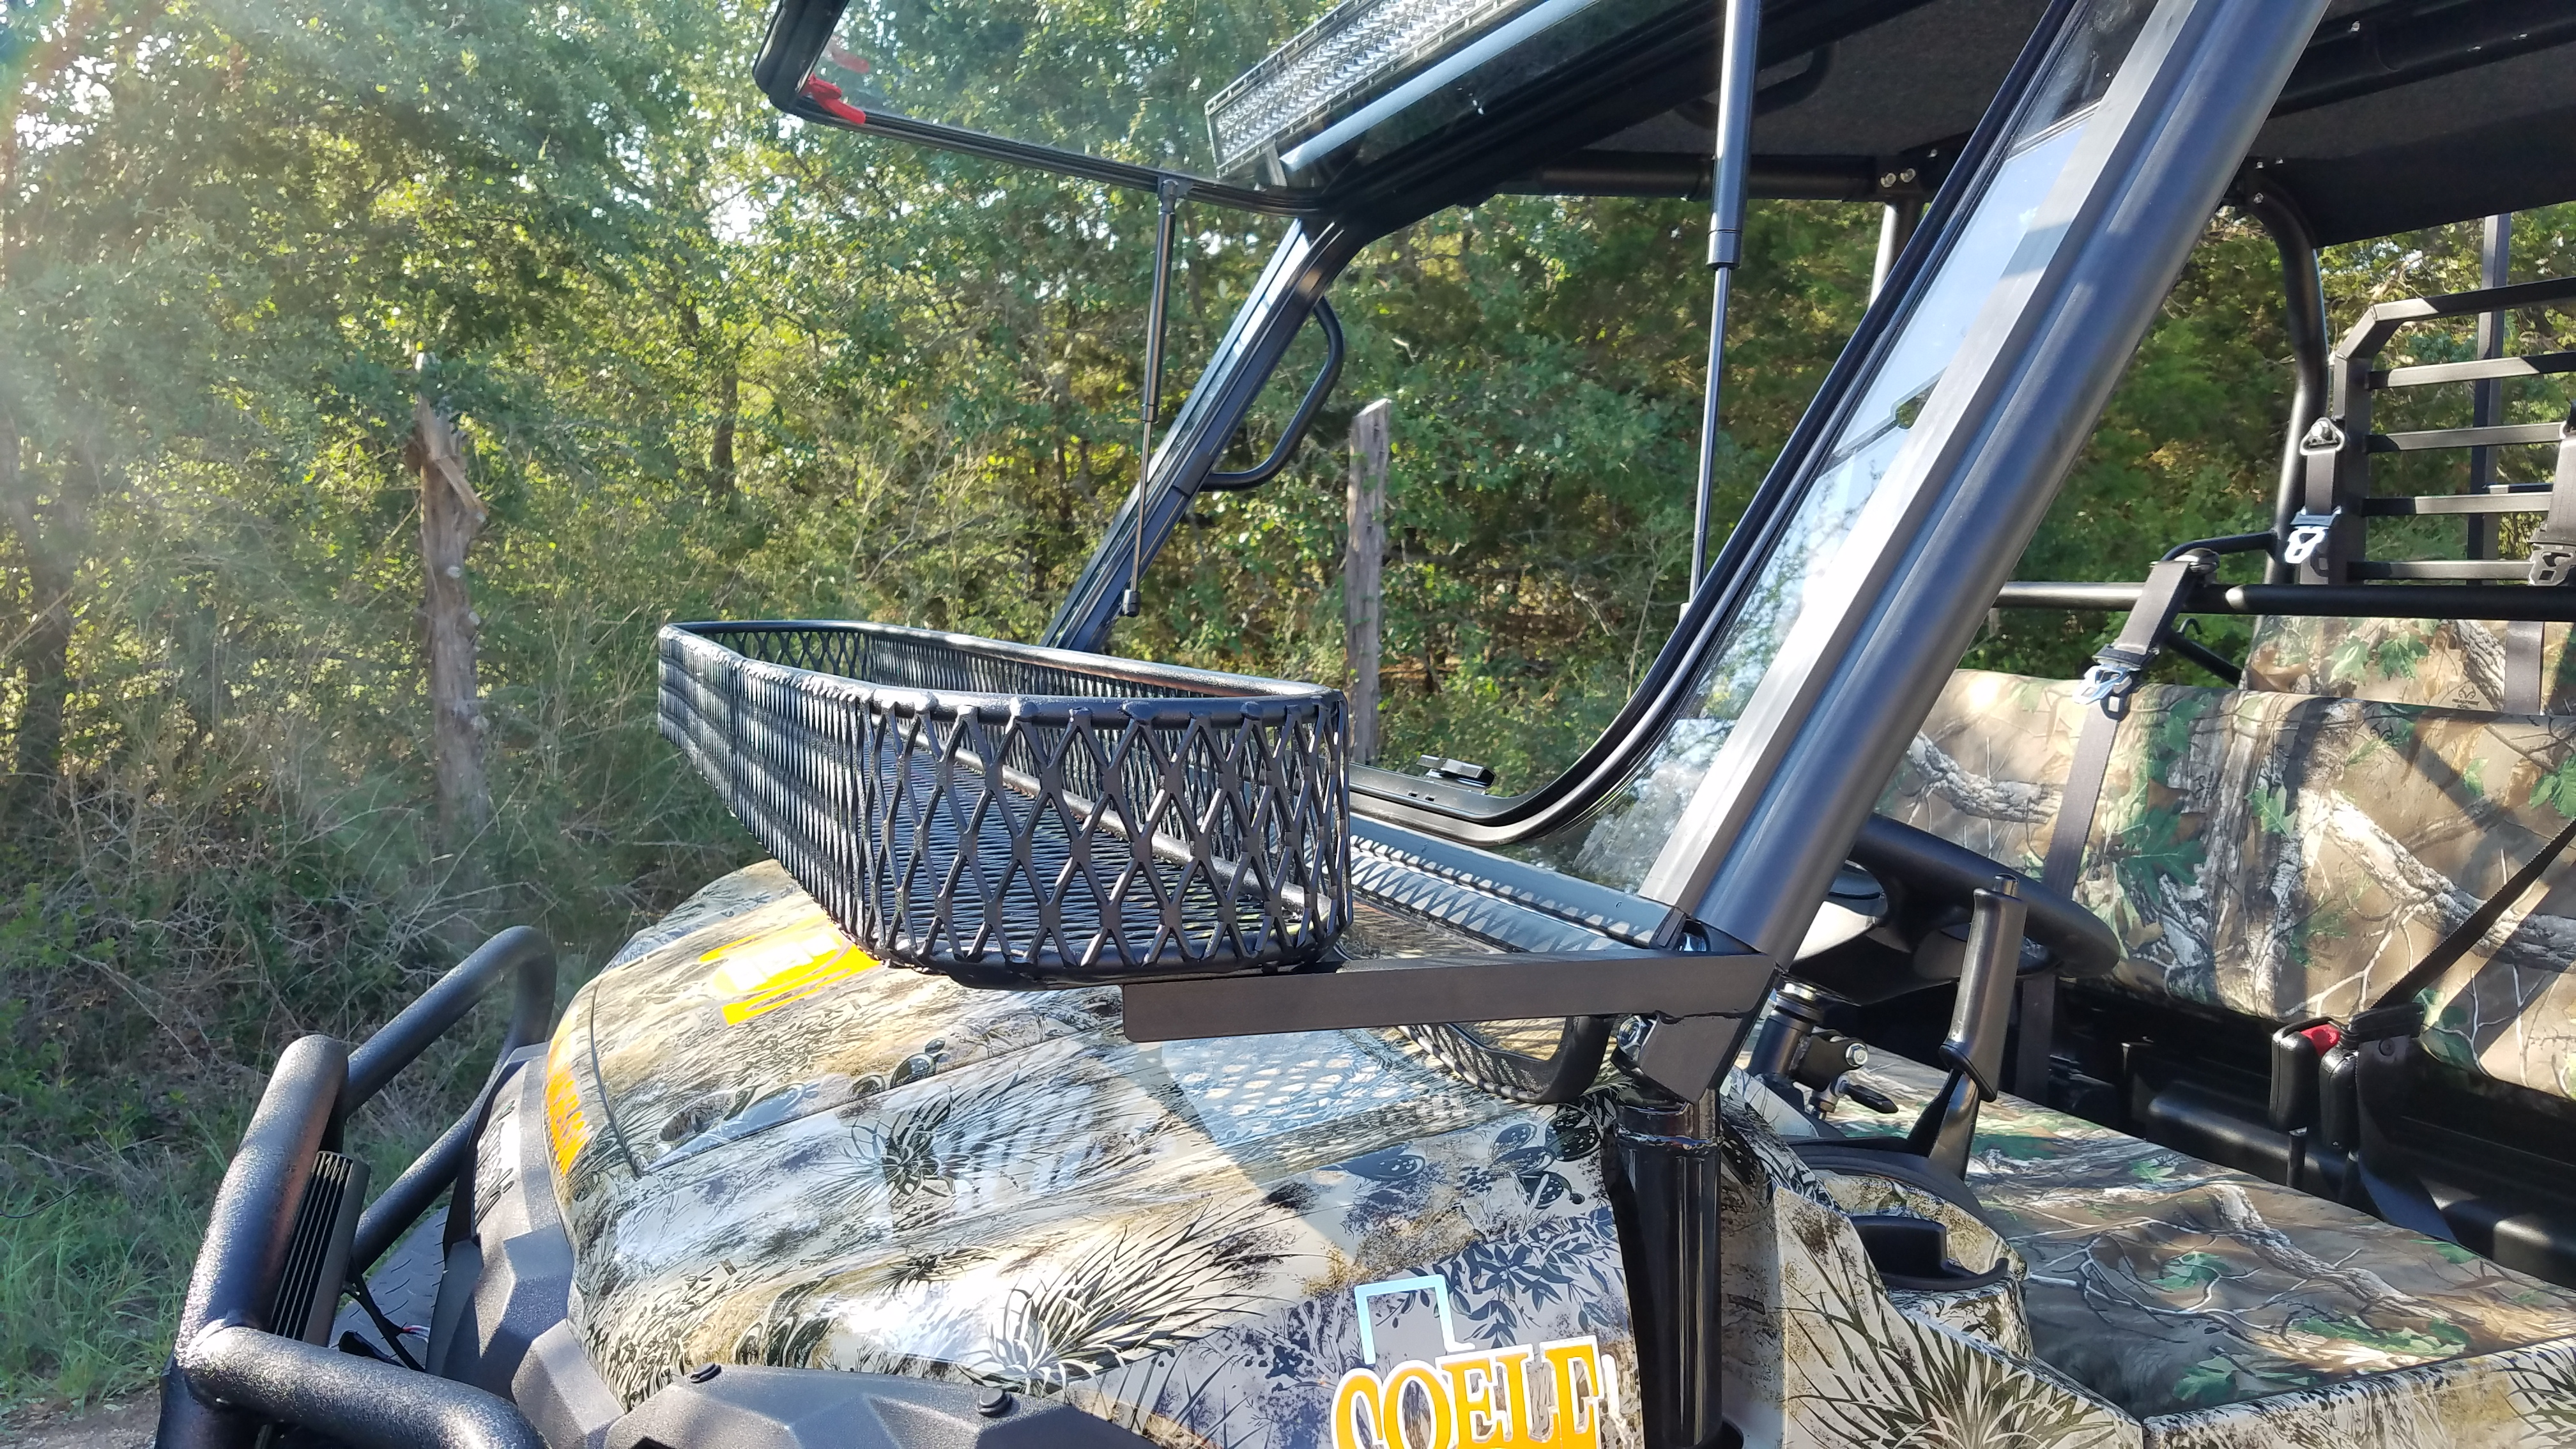 kawasaki-mule-pro-front-roll-bar-basket-rack-windshield.jpg